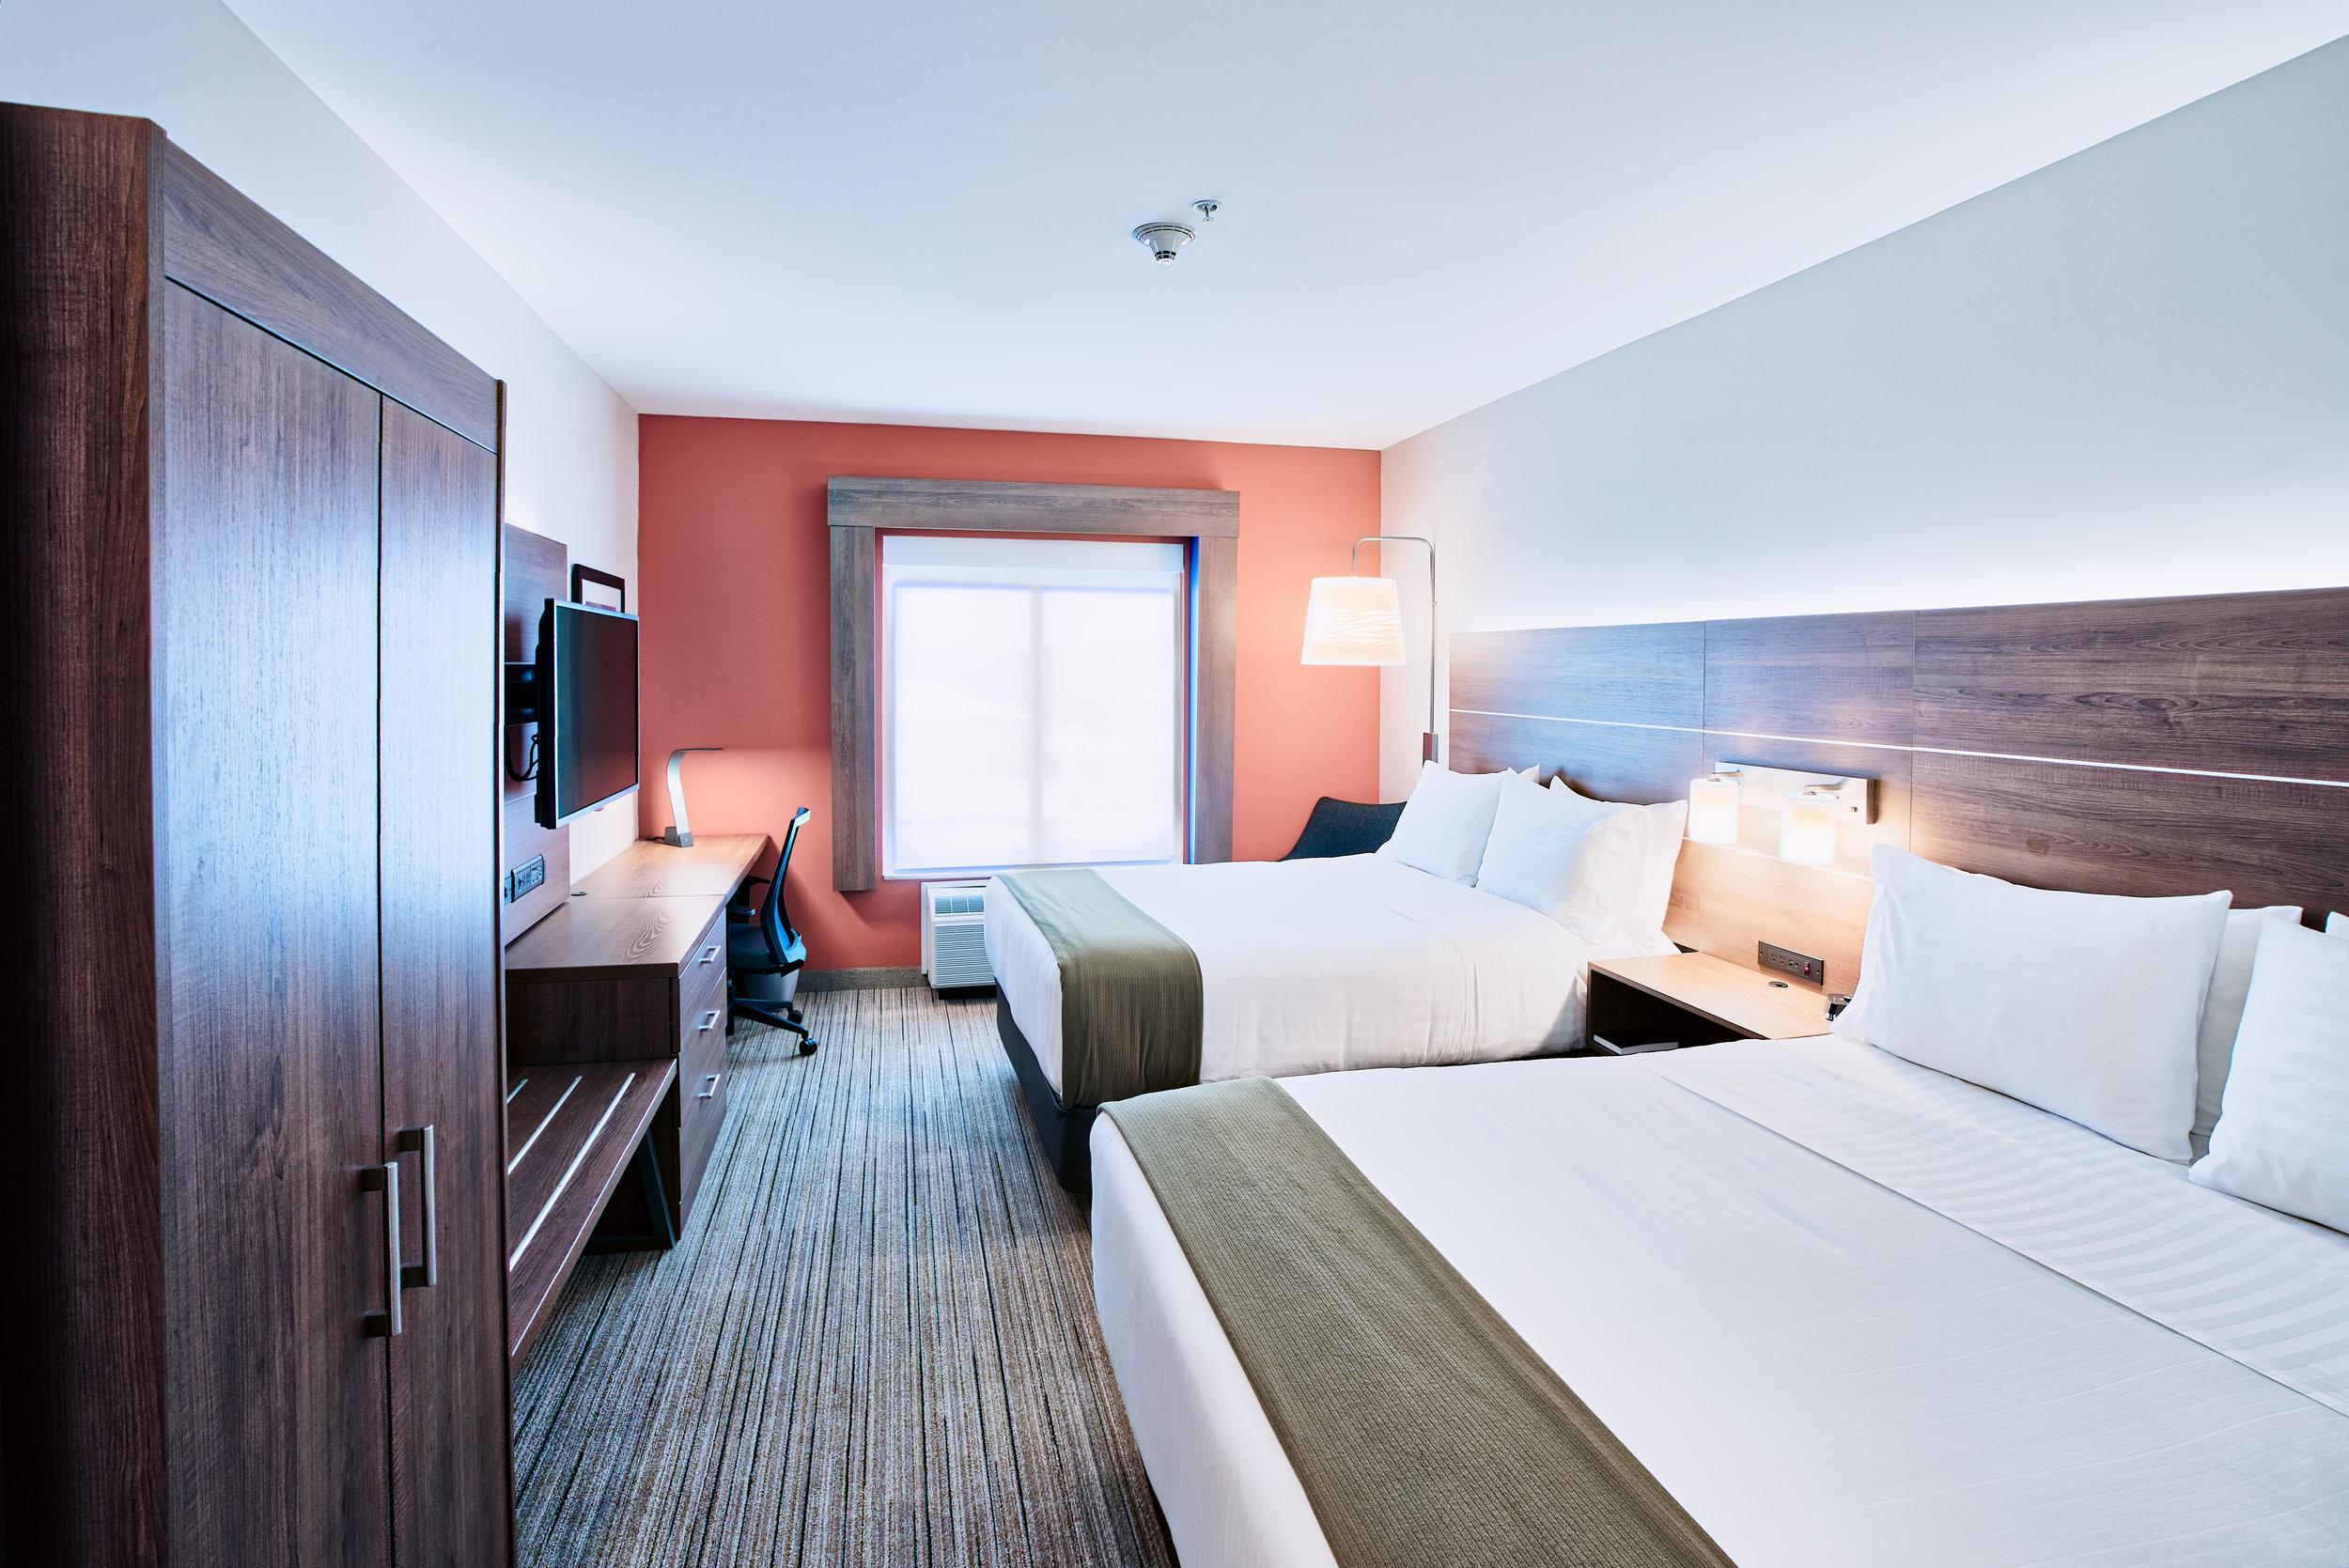 Holiday Inn Express - Room 3 A.jpg